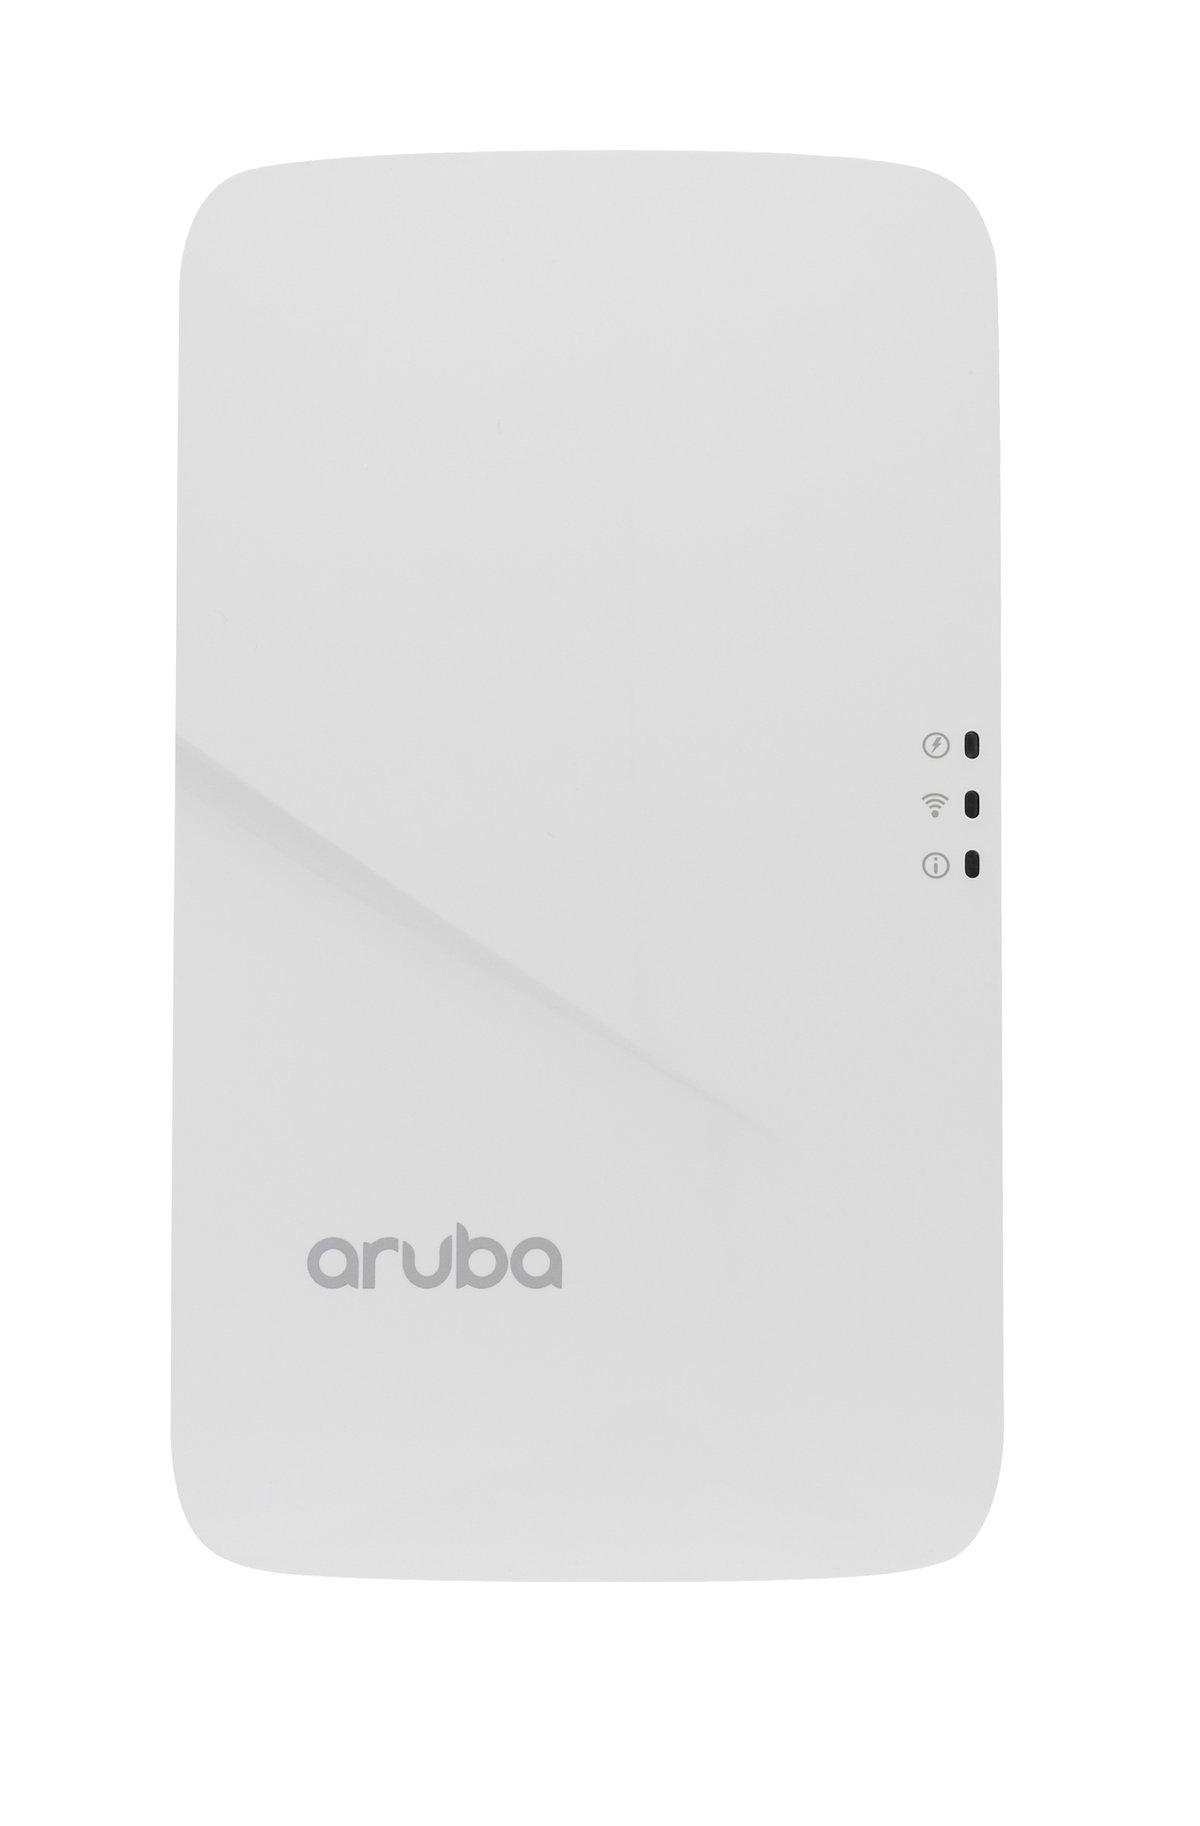 Hewlett Packard Enterprise Aruba AP-303H (RW) (5x JY678A) 867 Mbit/s Energía sobre Ethernet (PoE) Blanco